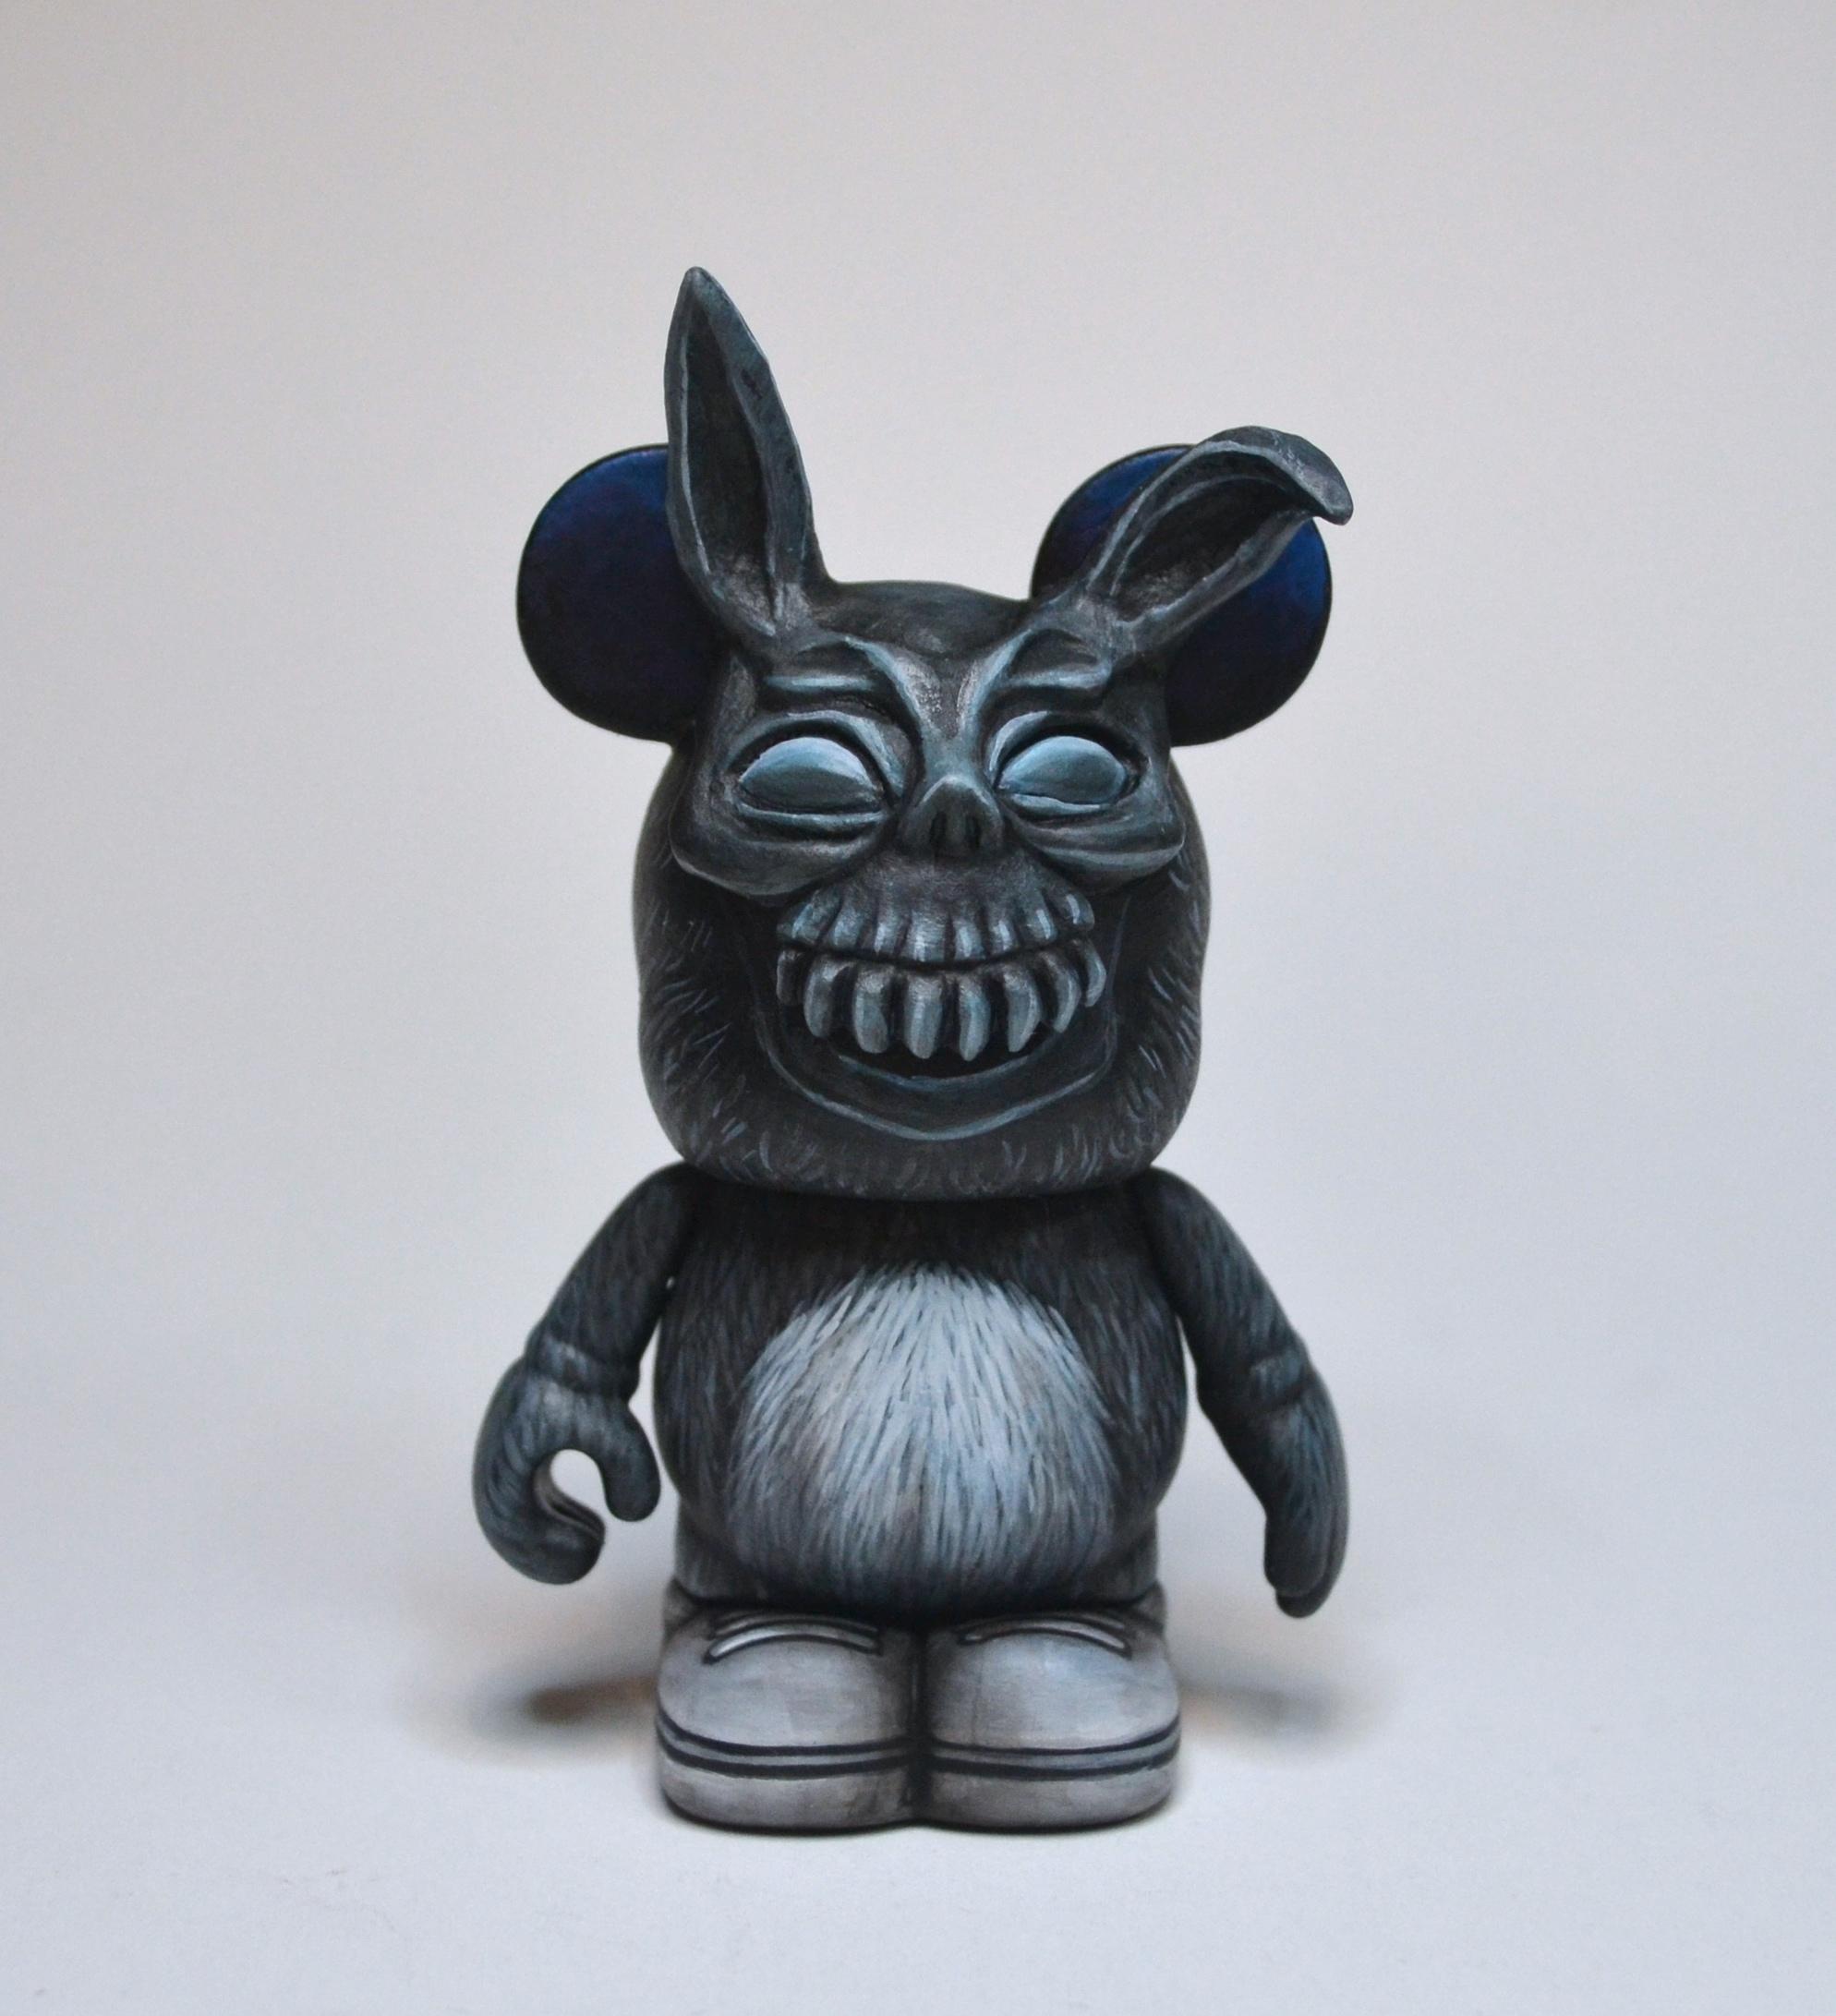 Frank Bunny